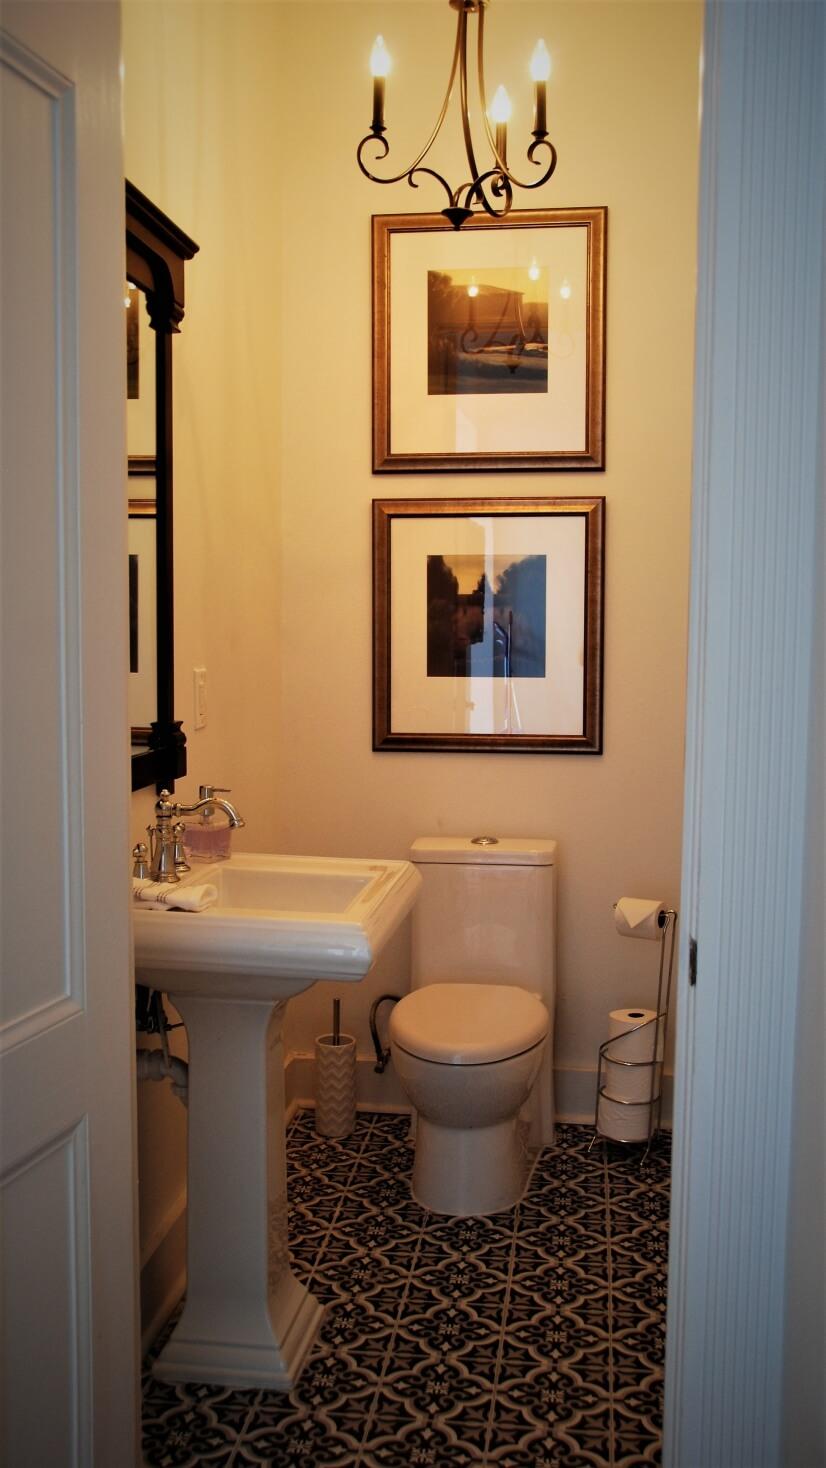 Black n' White Tiled Powder Bath featuring Pedestal Sink